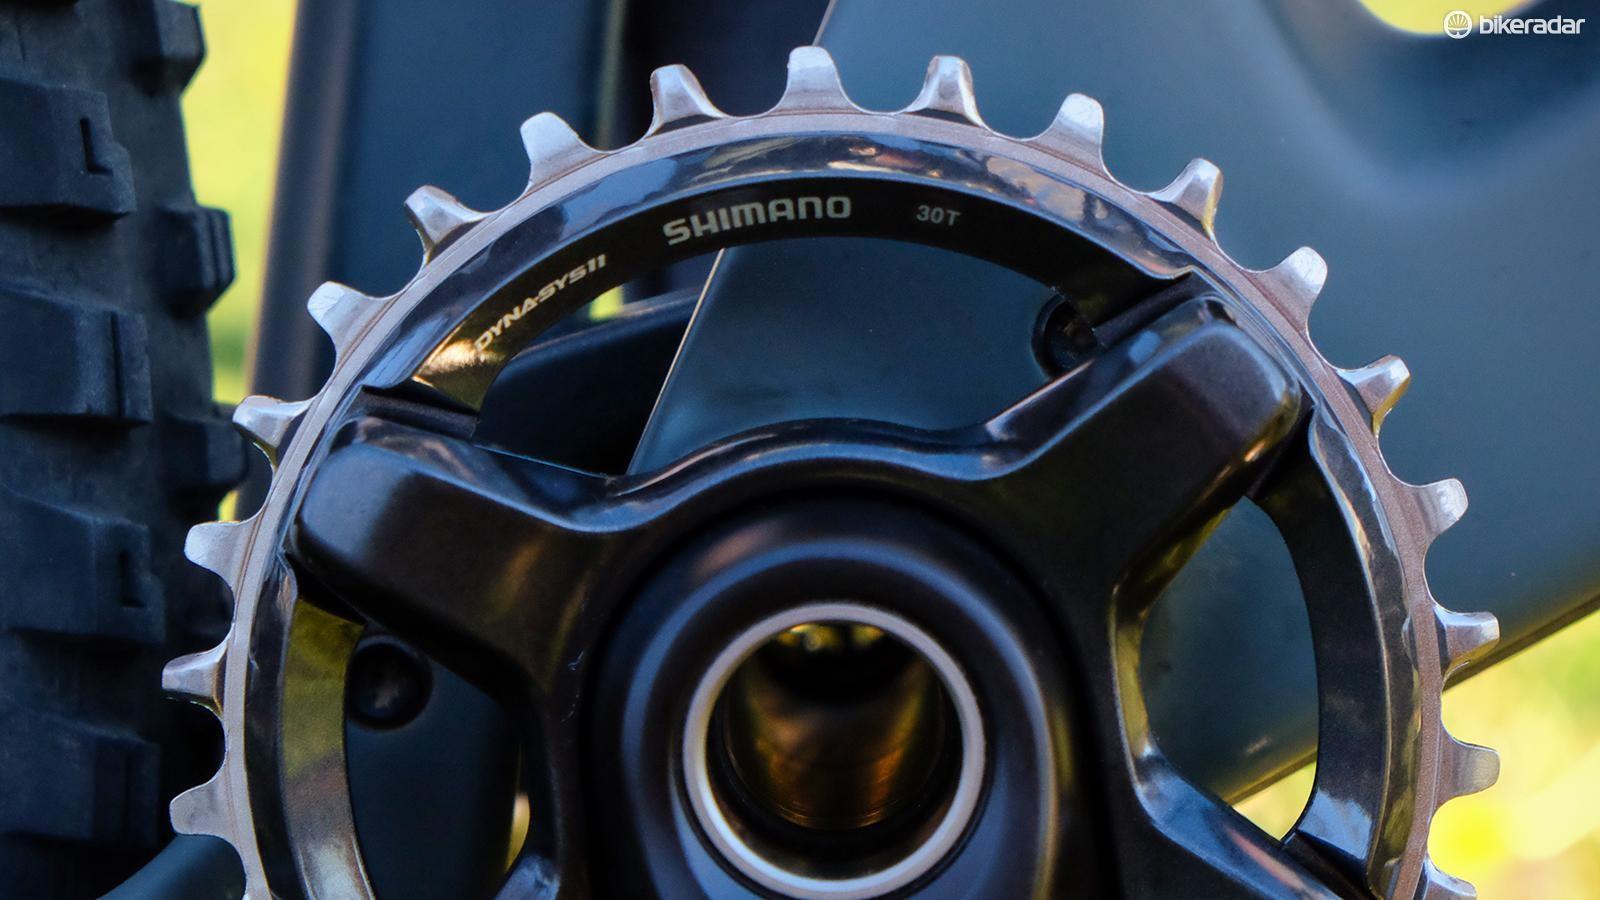 Shimano's narrow-wide XT chainring